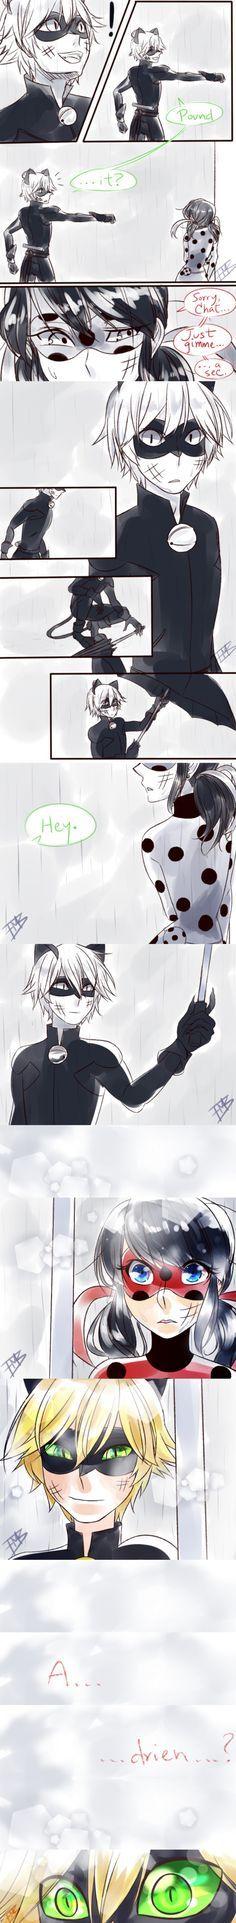 KYA!!! Juro que escuche in the rain en mi cabeza mientras veia esto ^0^